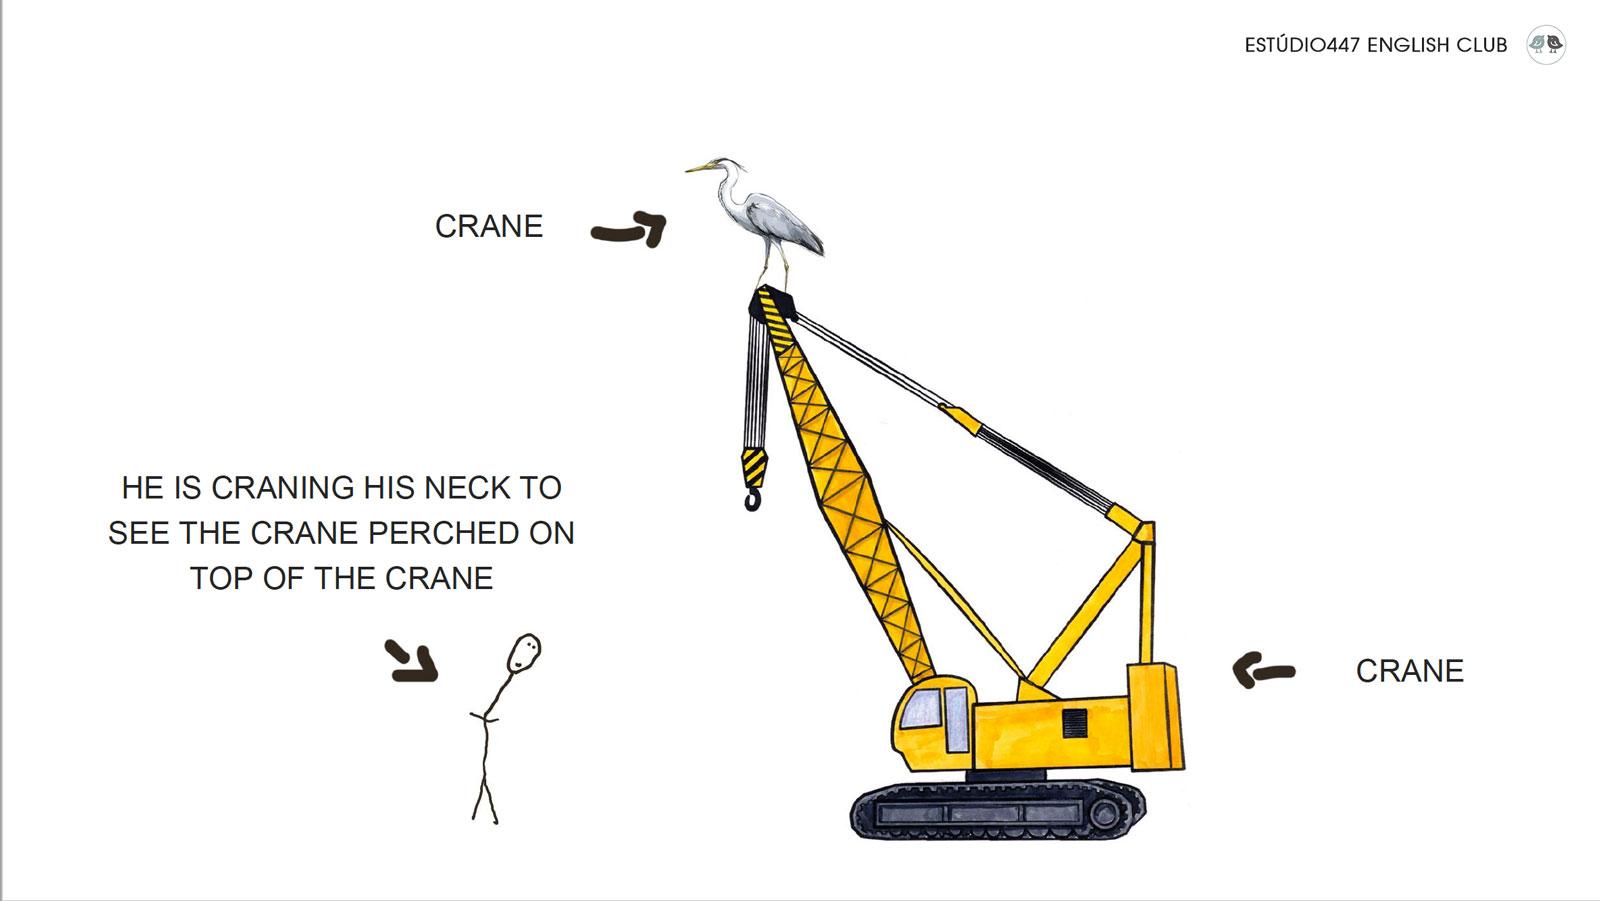 Estúdio447 English Club - Phrasal Verbs - Crane